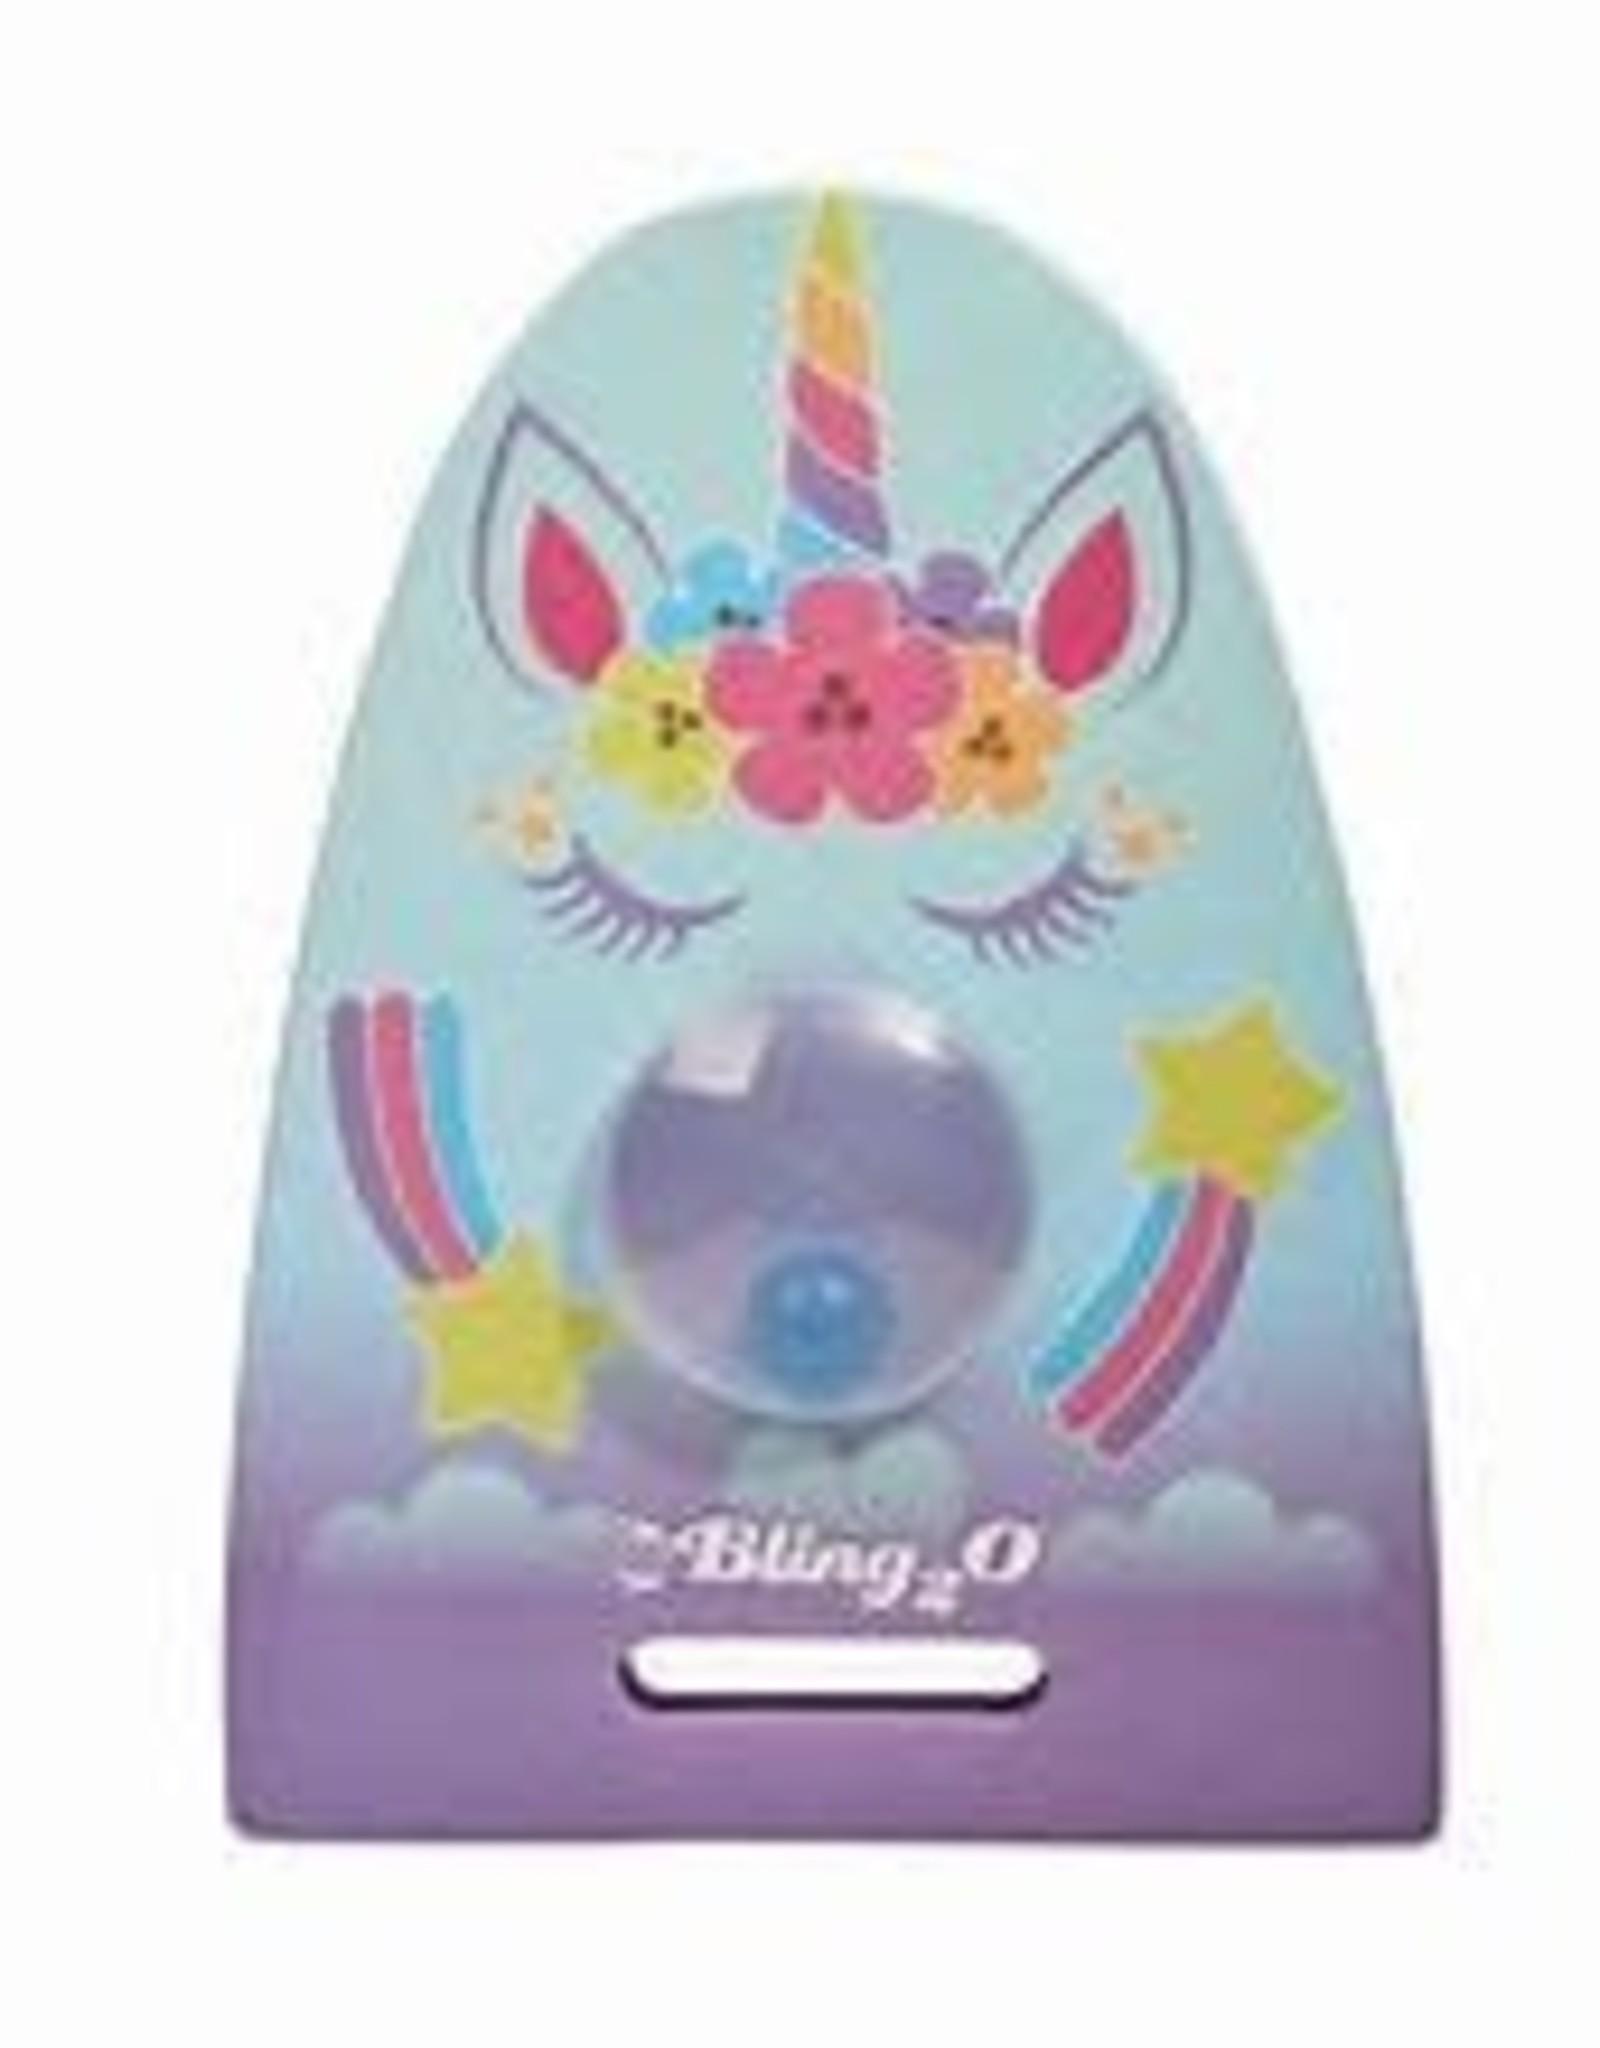 Bling2o Unicorn Kickboard